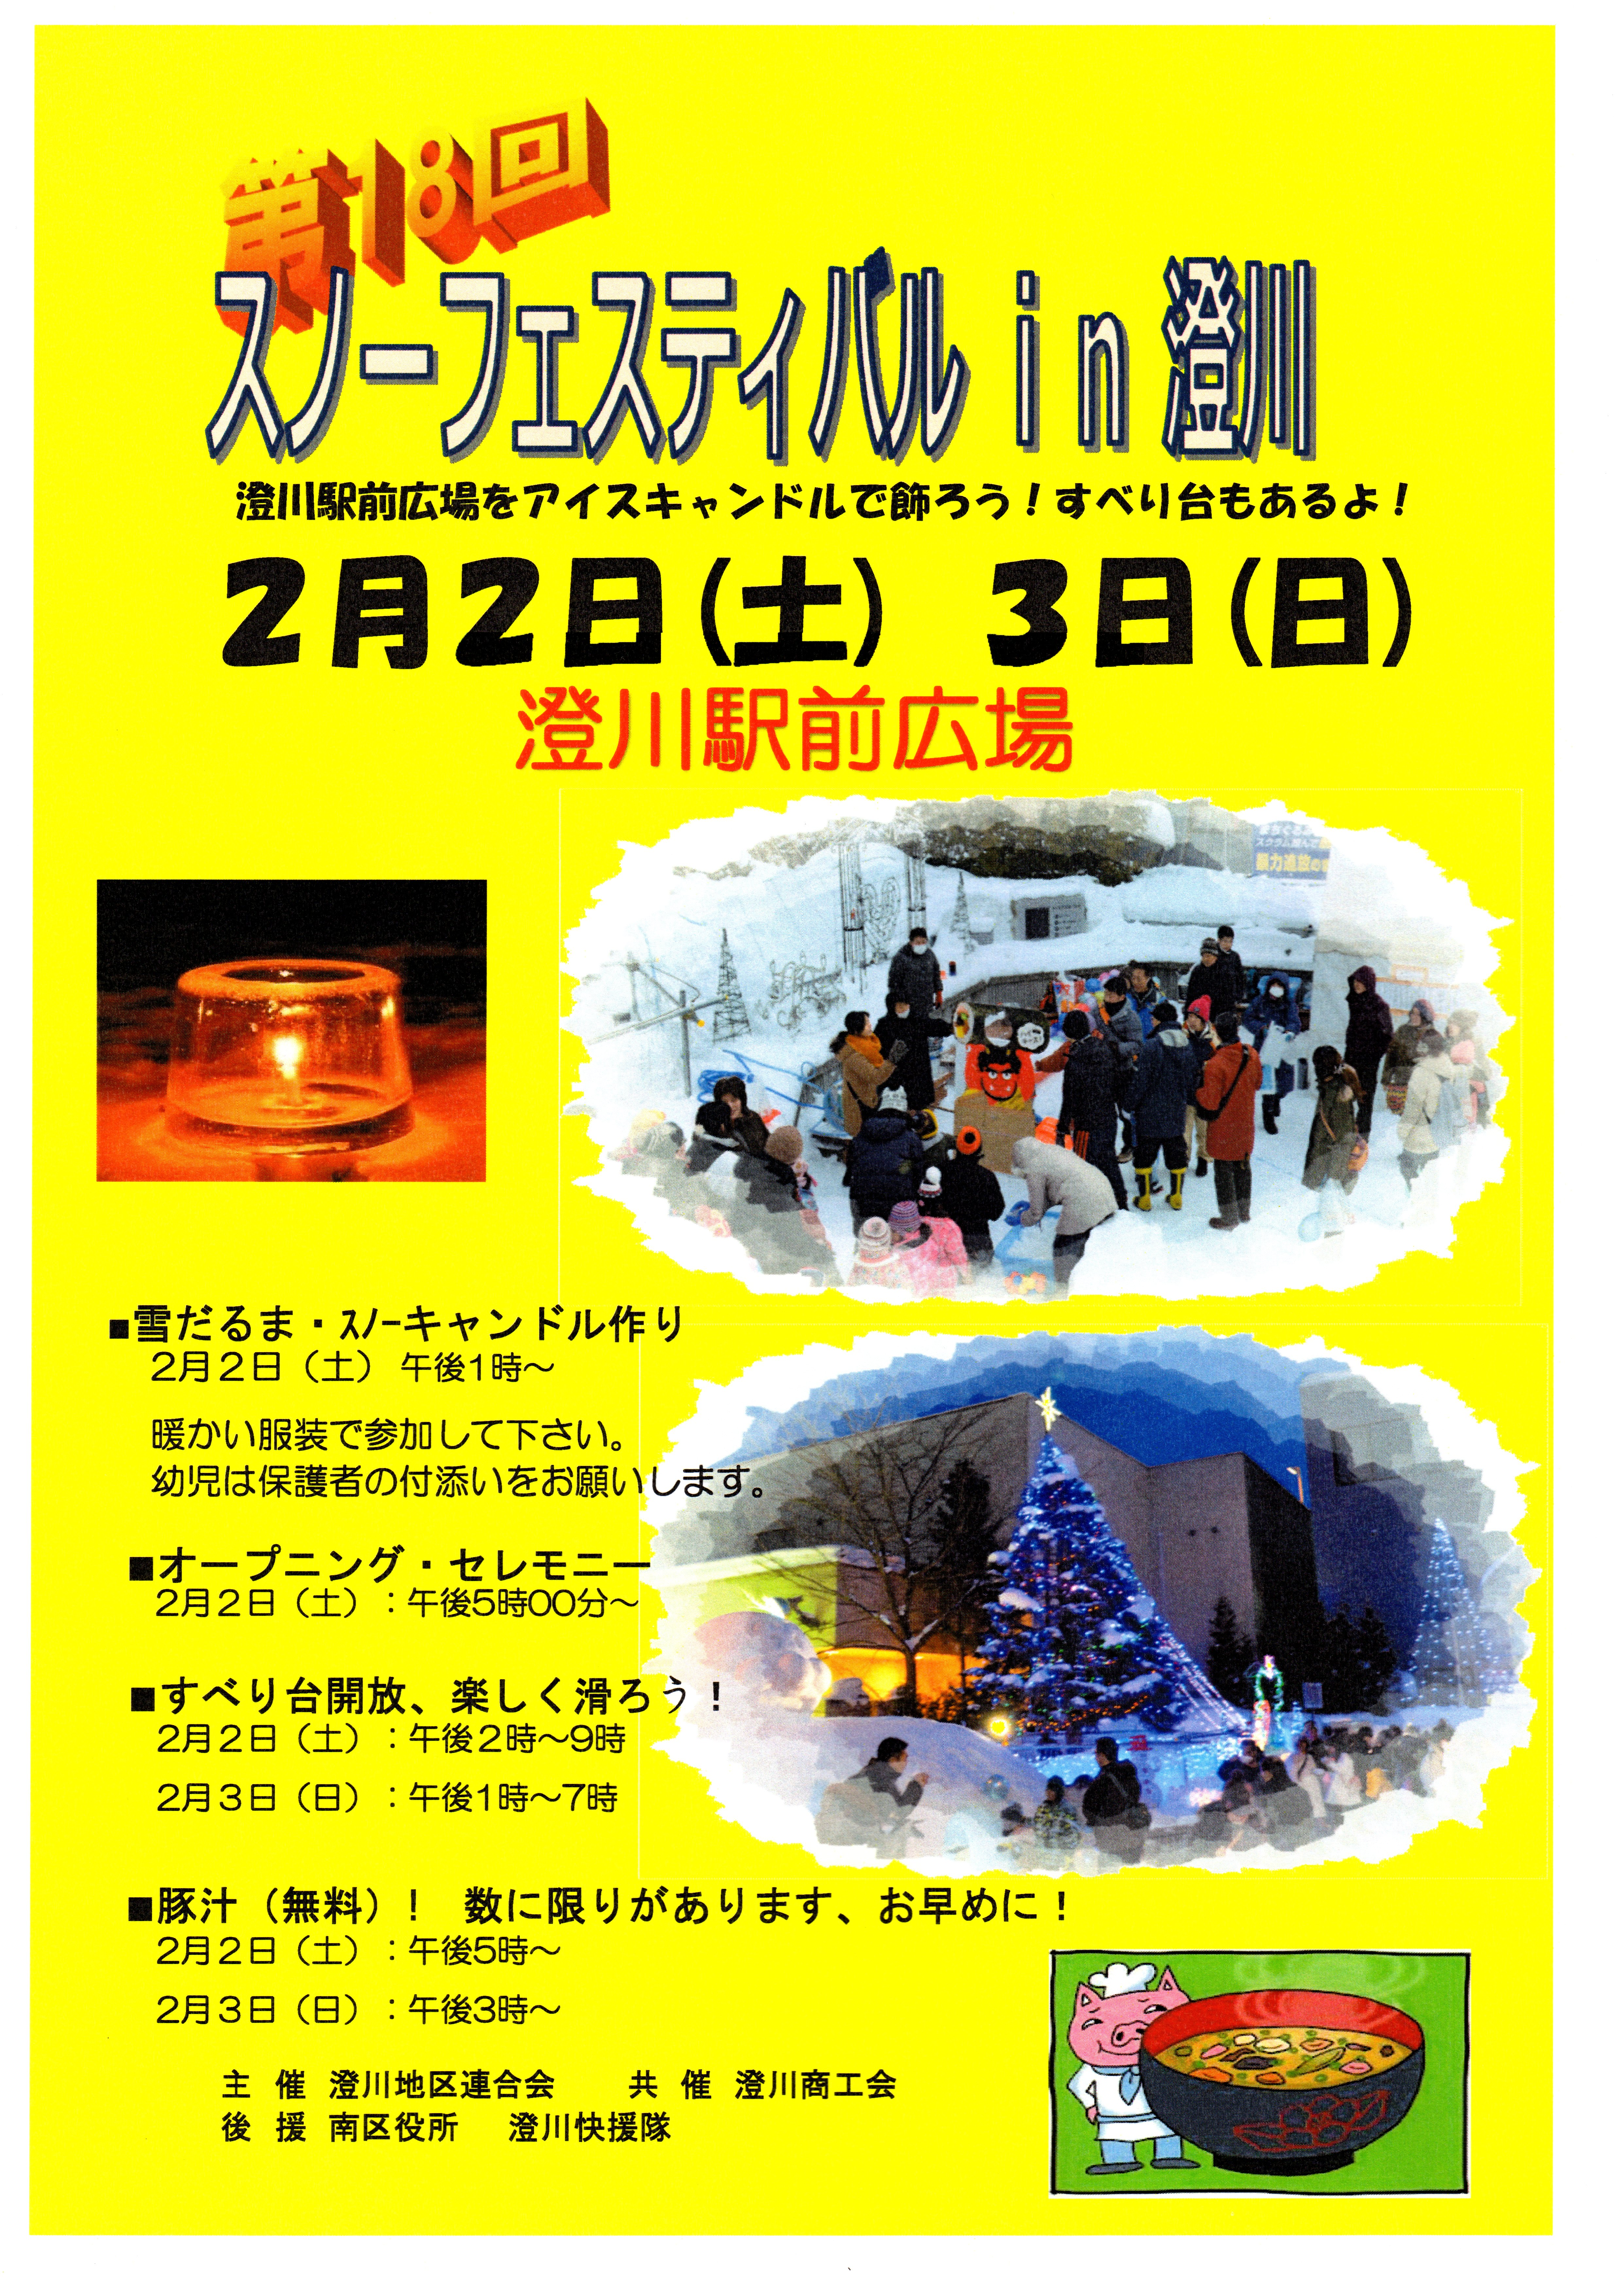 http://sumikawa.info/event/%E3%81%B5%E3%82%86%E3%83%95%E3%82%A7%E3%82%B92019.jpg